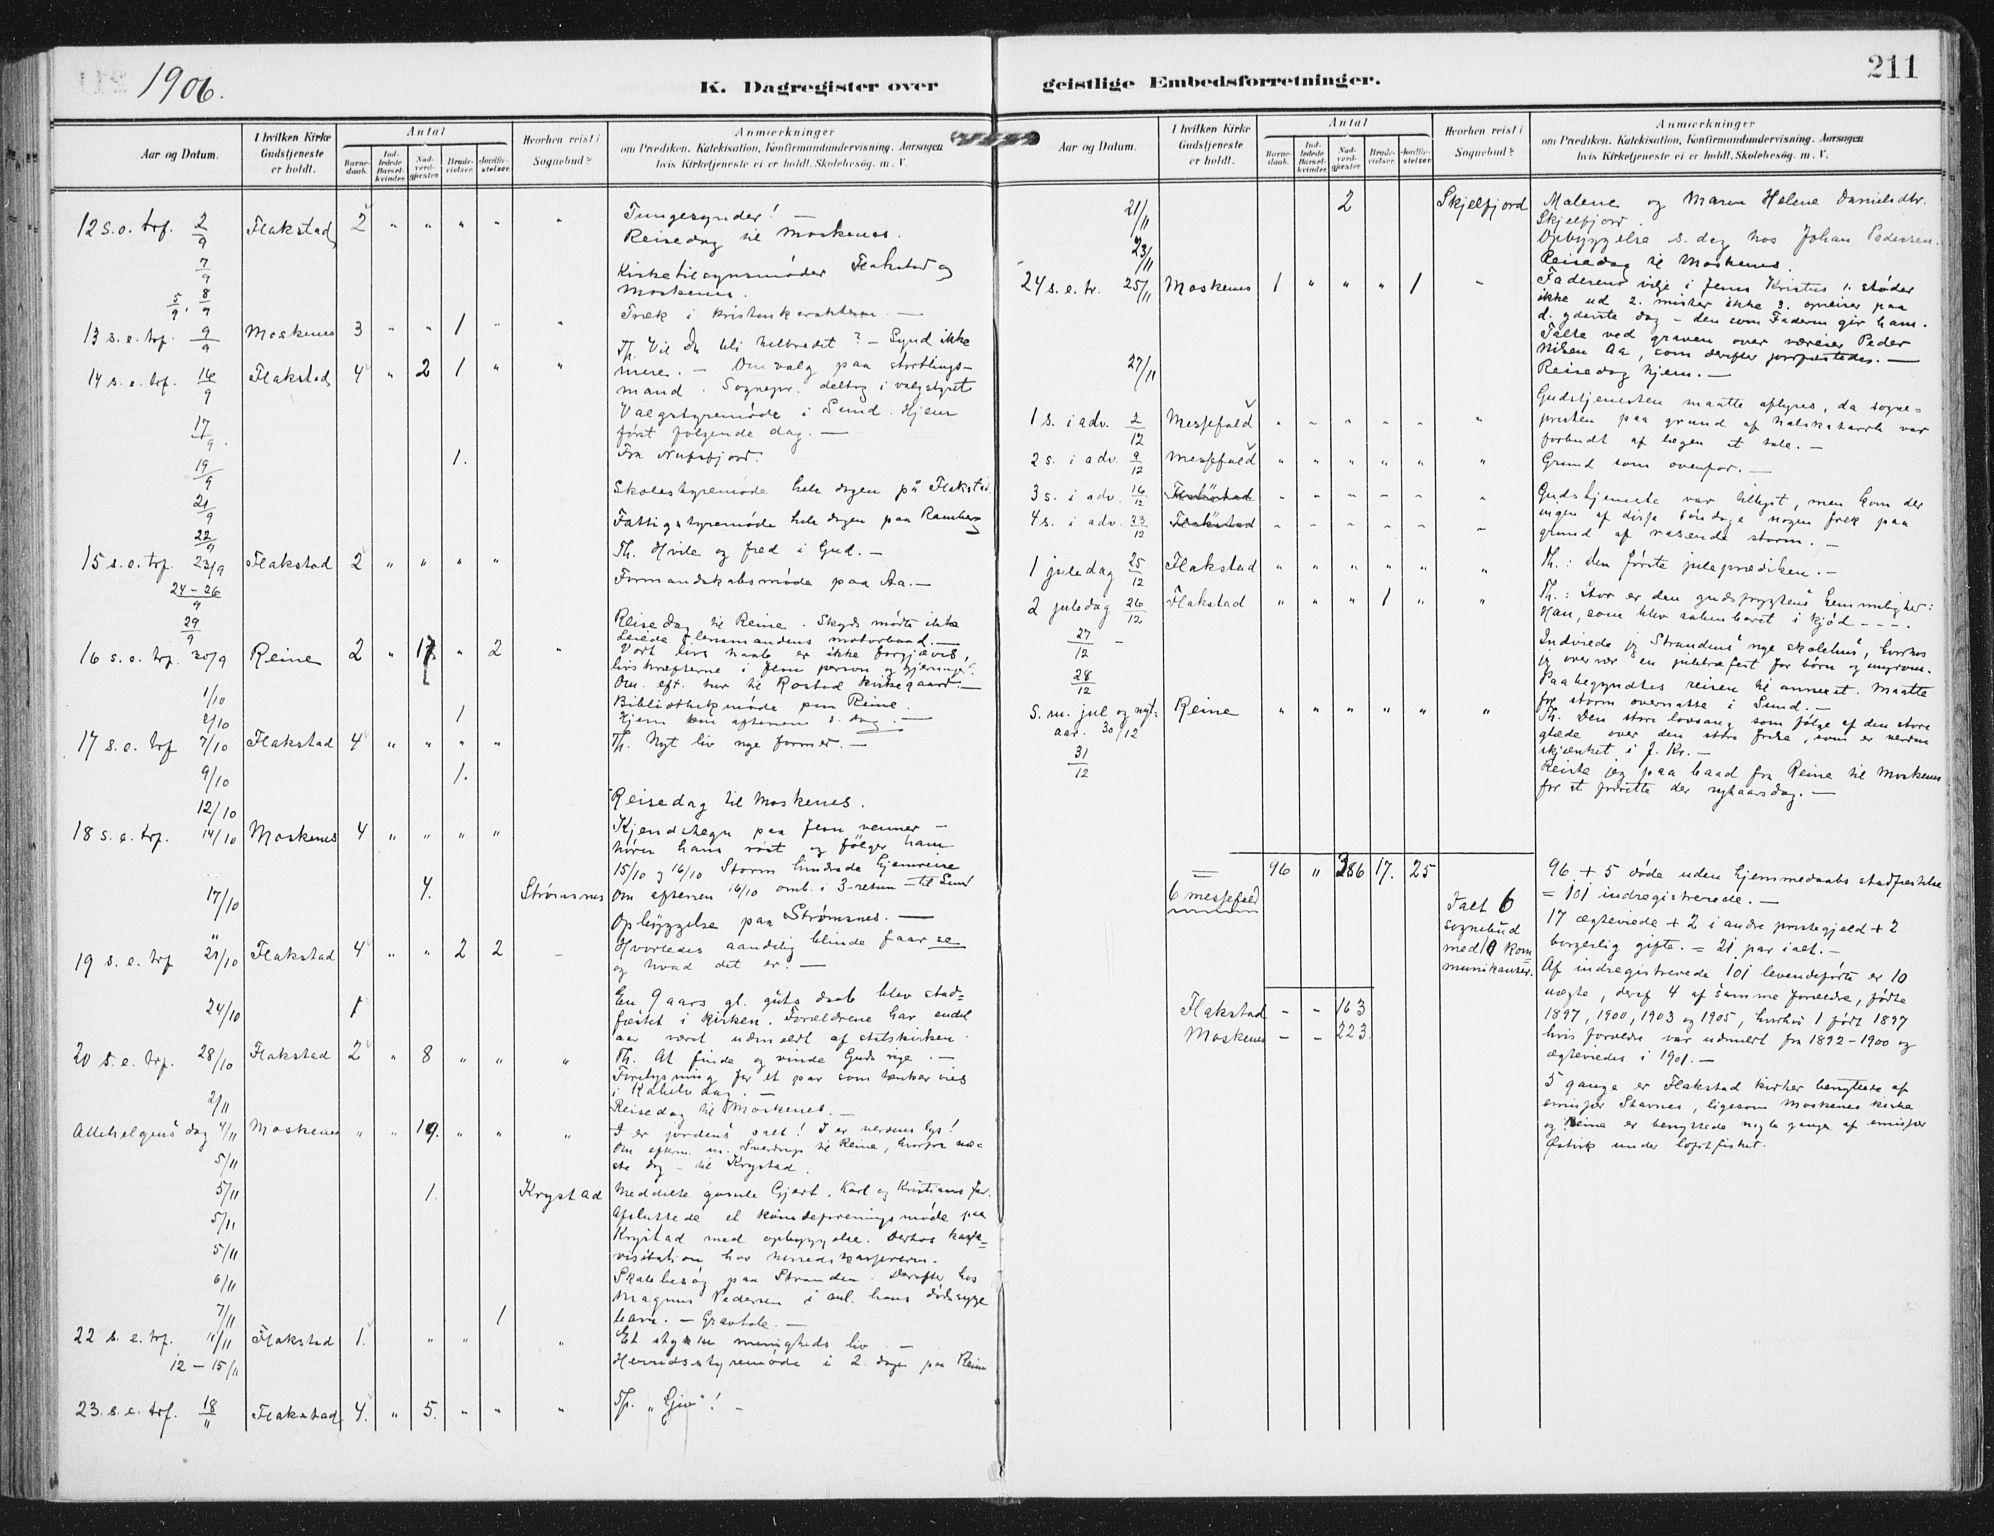 SAT, Ministerialprotokoller, klokkerbøker og fødselsregistre - Nordland, 885/L1206: Ministerialbok nr. 885A07, 1905-1915, s. 211